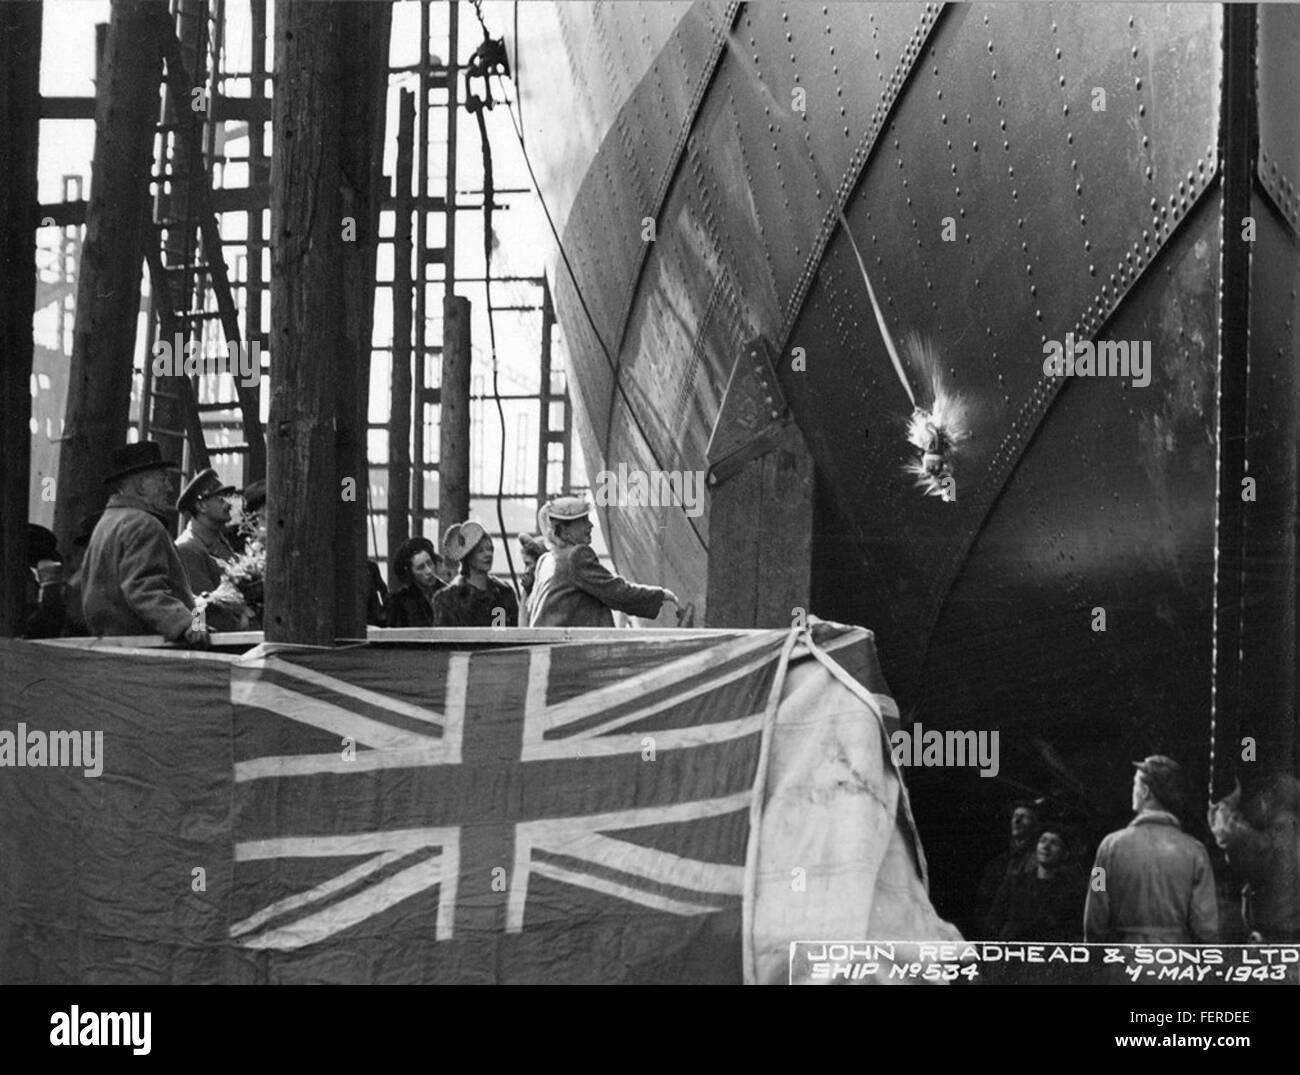 Launch of the cargo ship 'Kelmscott' Launch of the cargo ship 'Kelmscott' - Stock Image